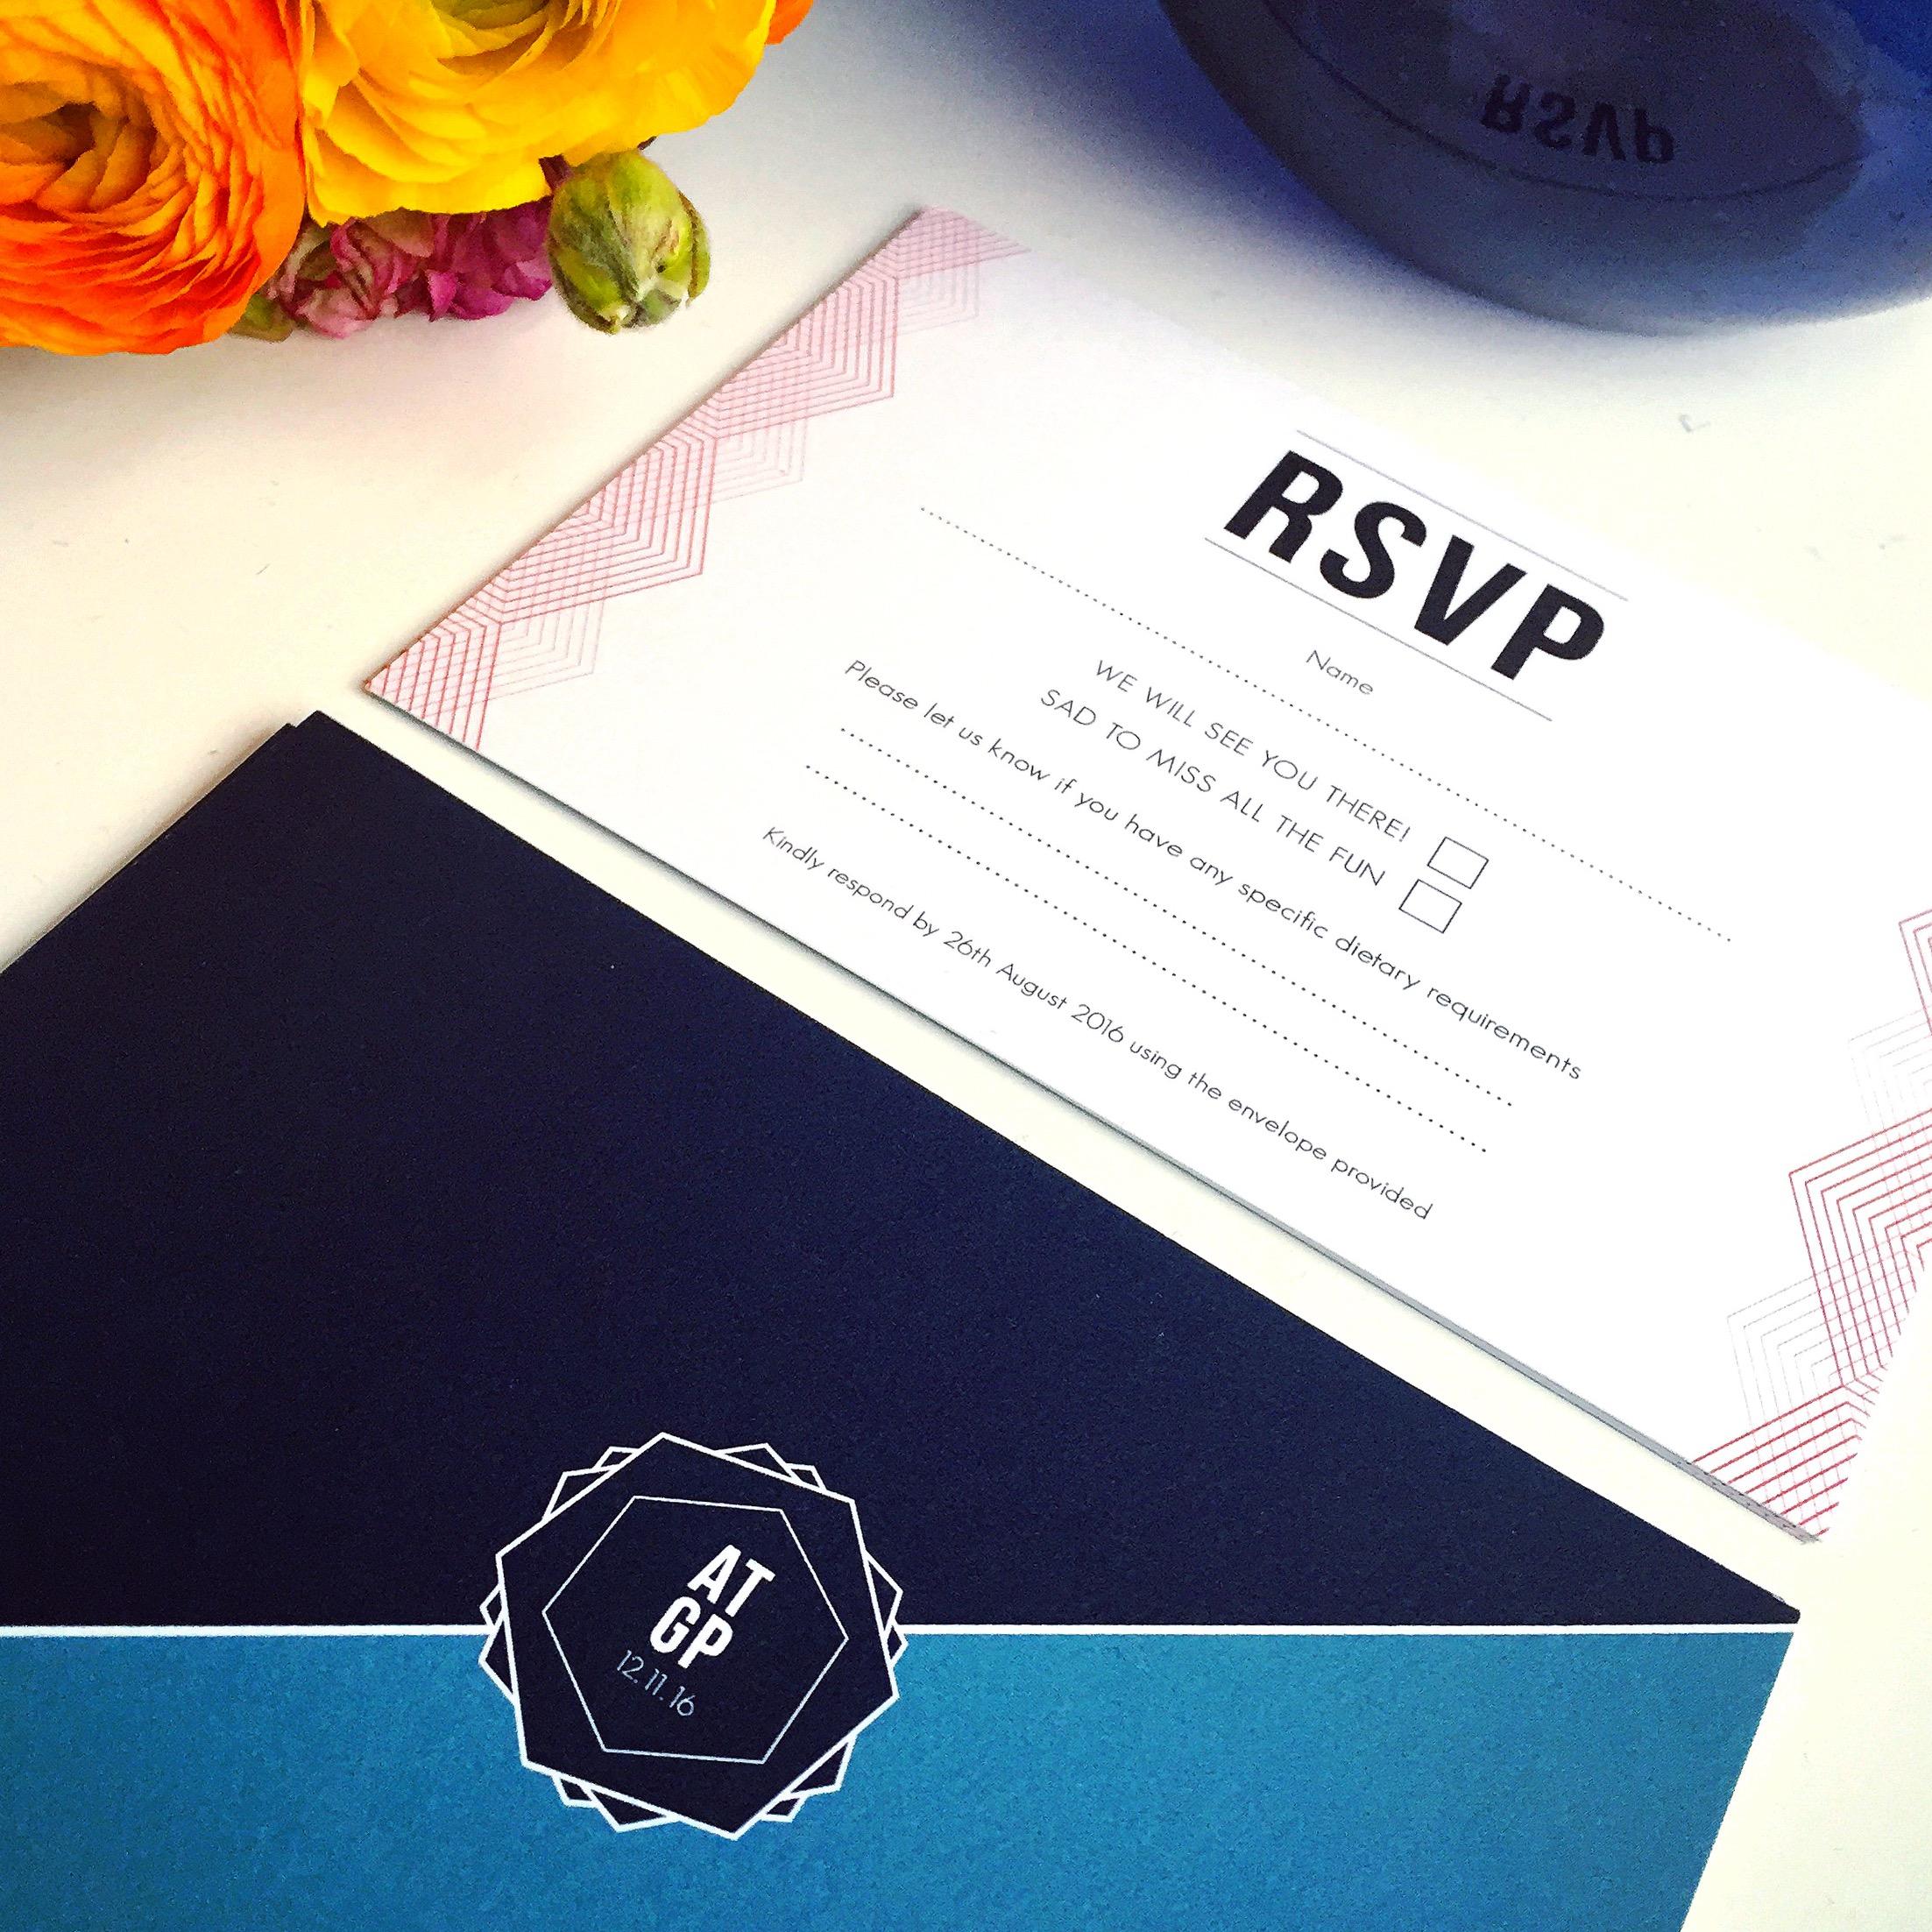 geometric-copper-invite-wedding-the-ink-closet-rsvp-1.JPG